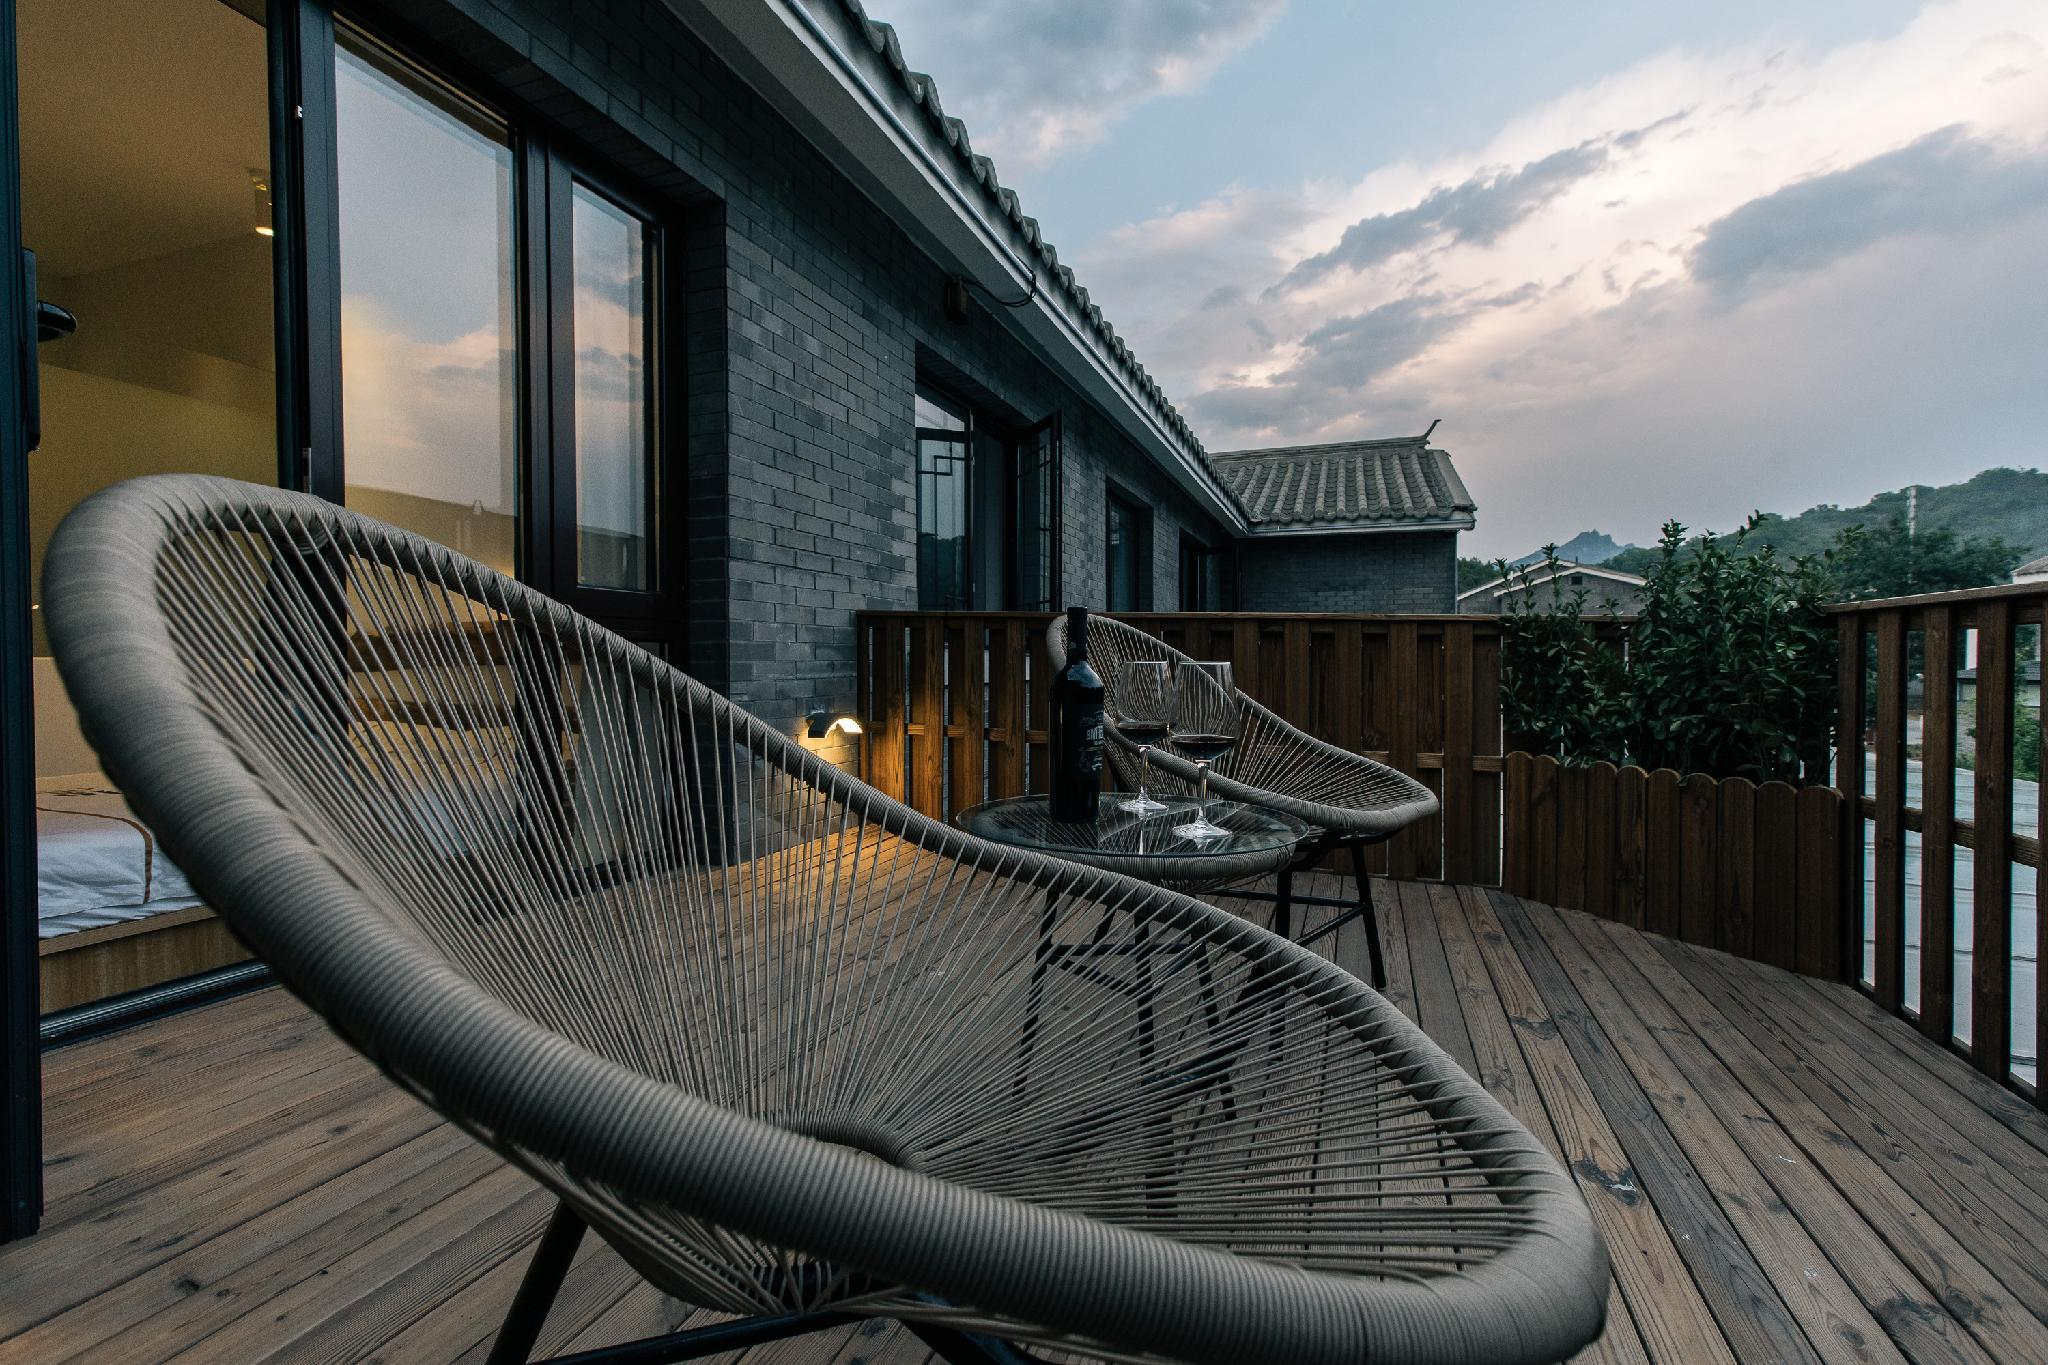 Landscape Courtyard Room